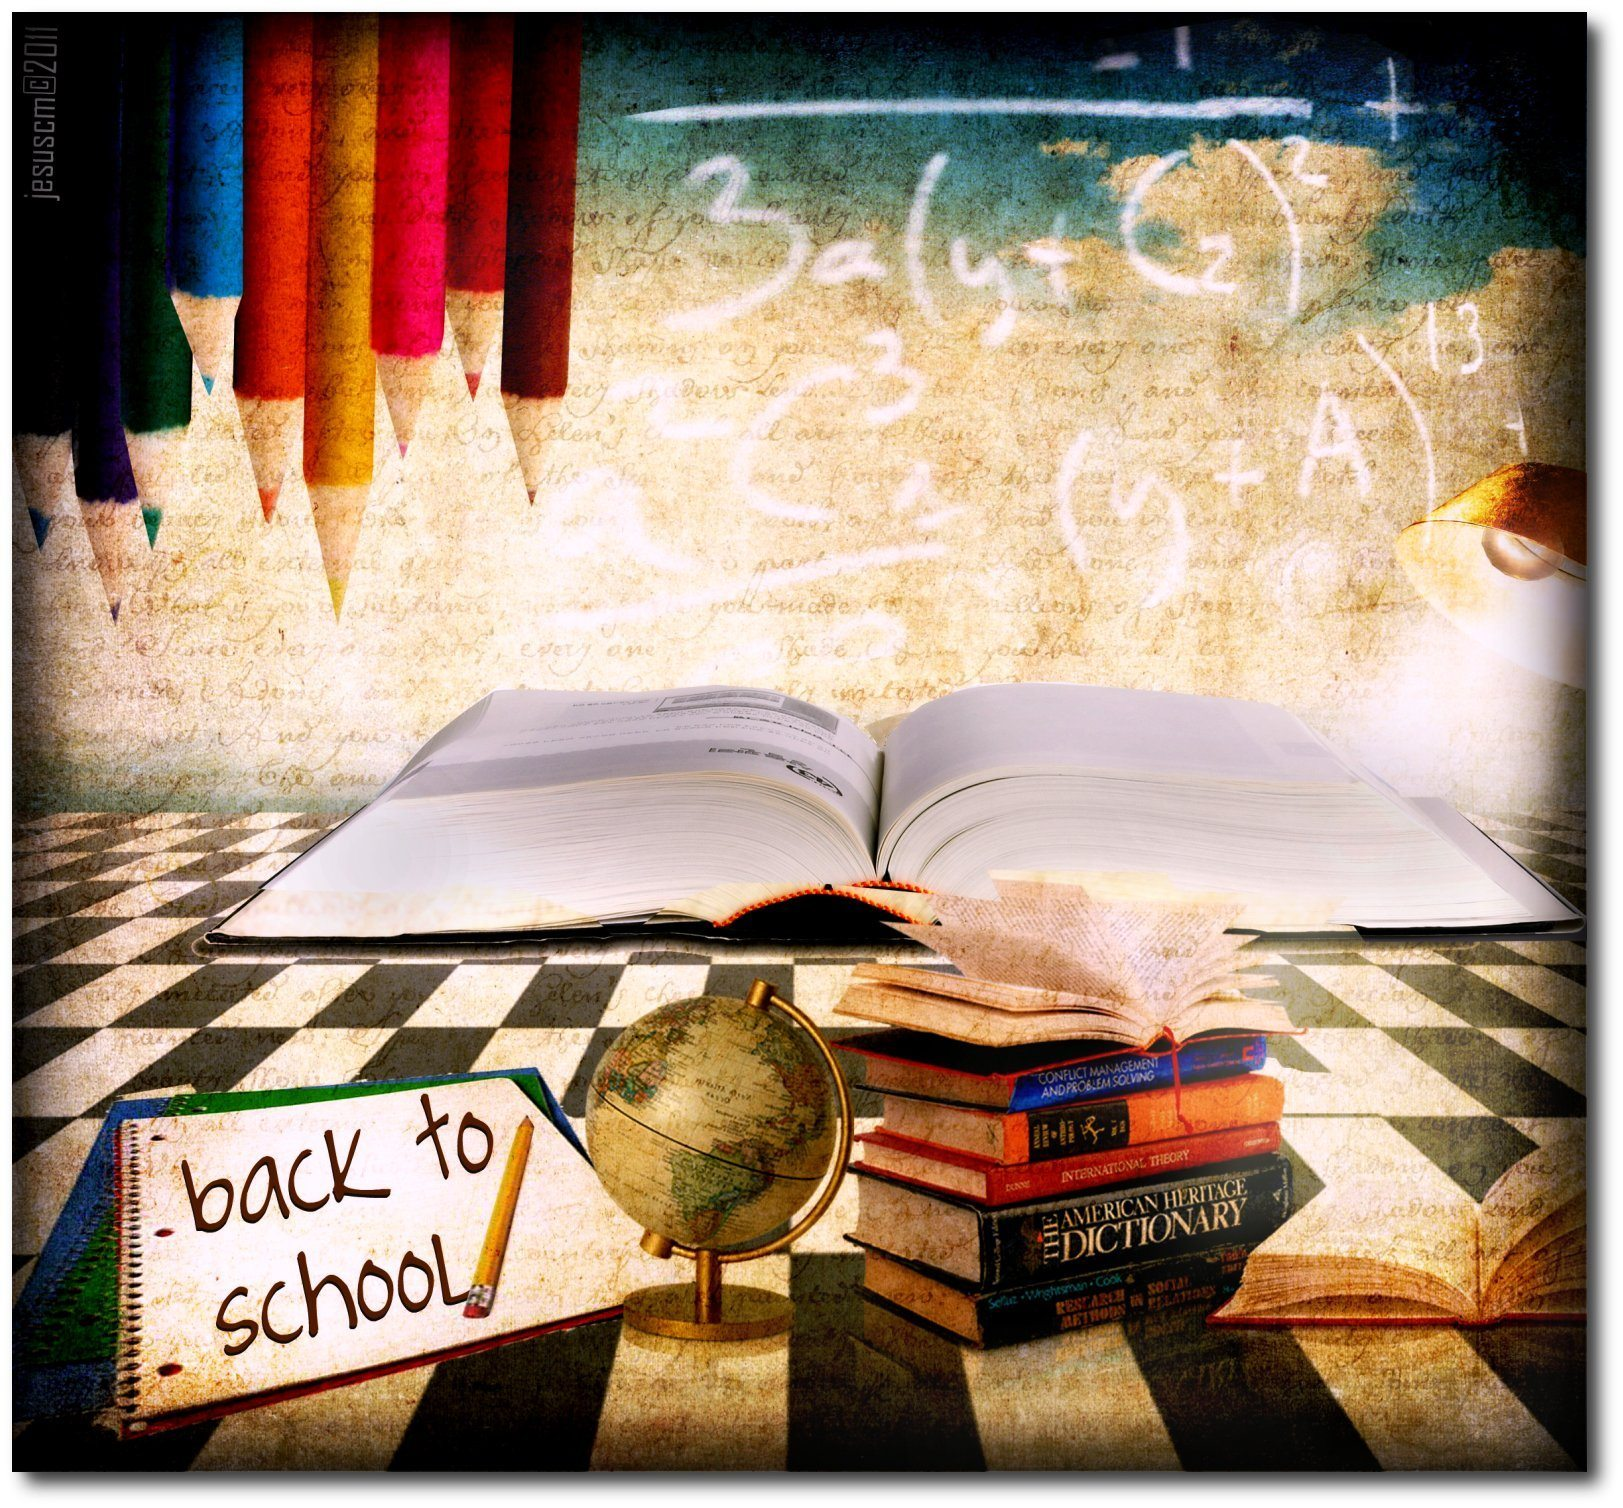 Back to School  Image: flickr user Jesuscm some rights reserved